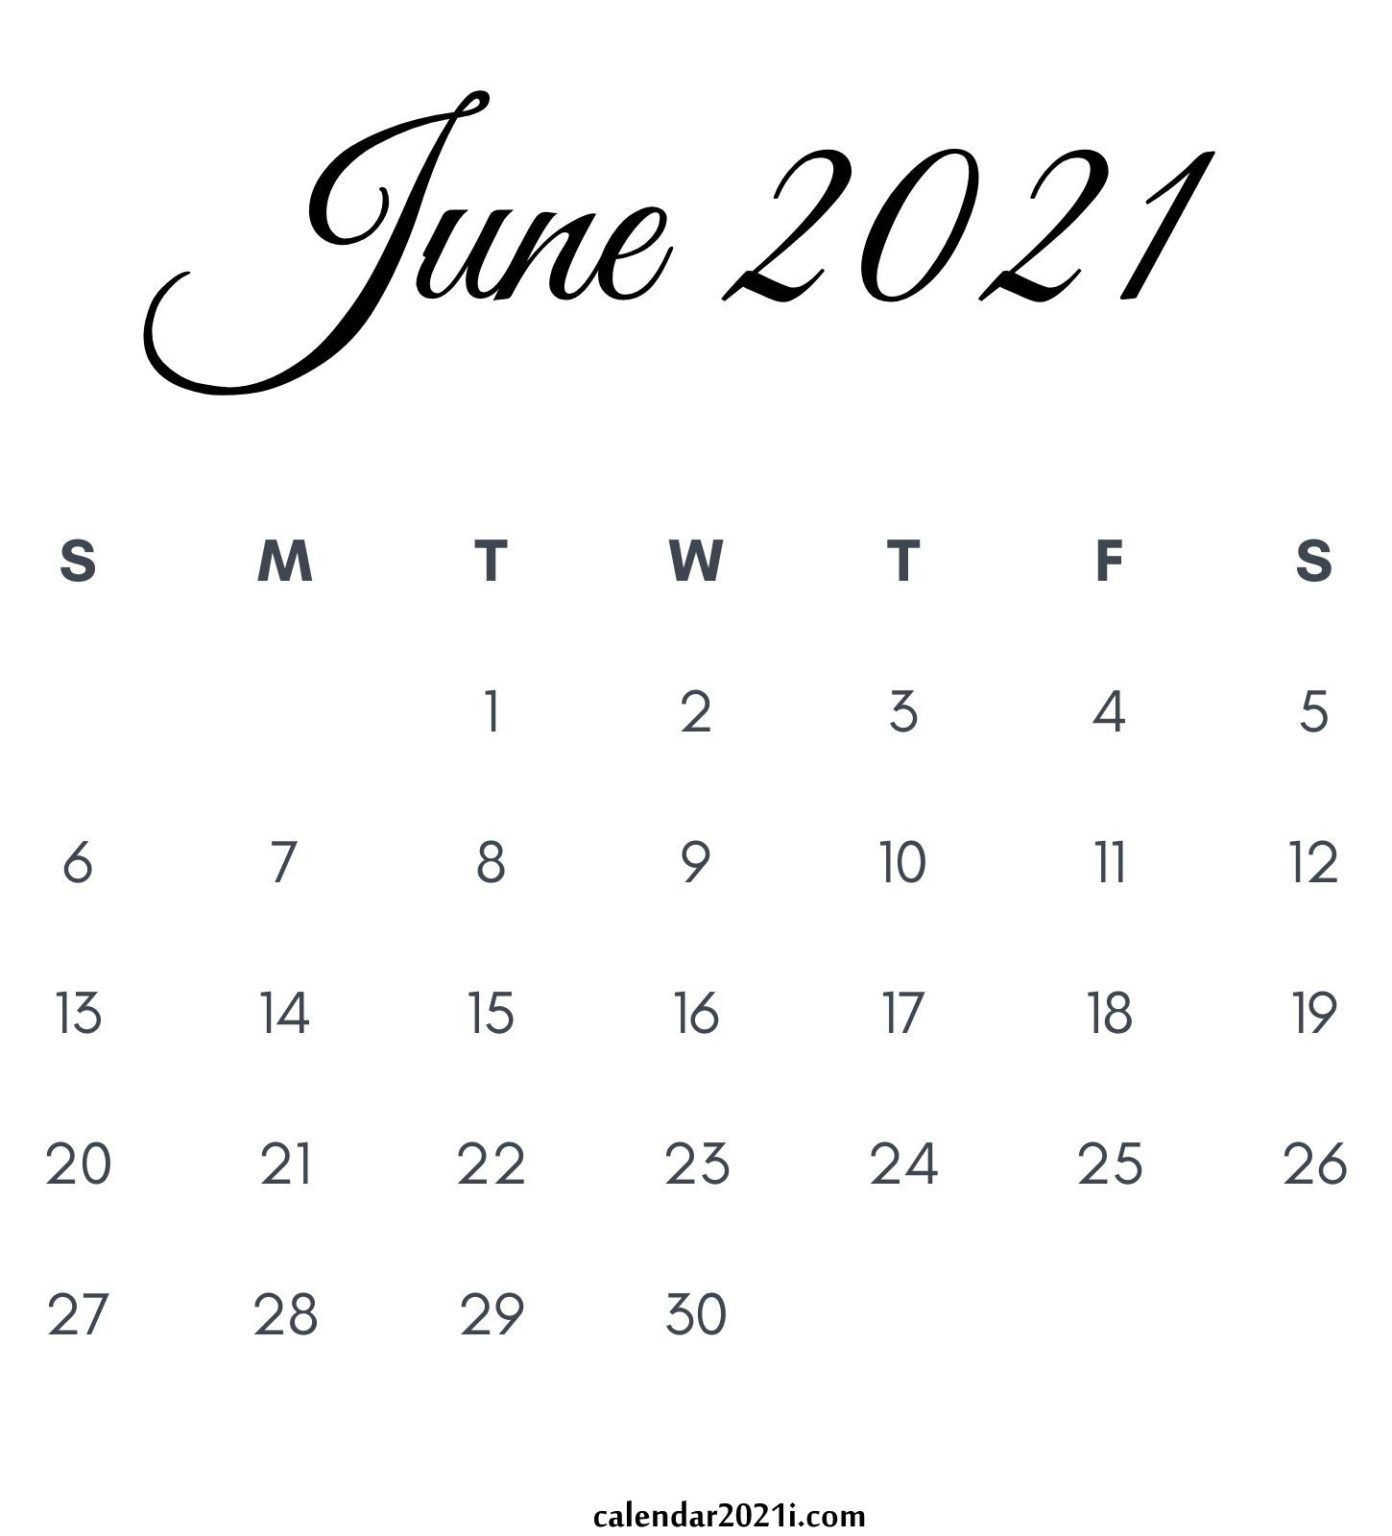 June 2021 Calendar Printable | June Calendar Printable